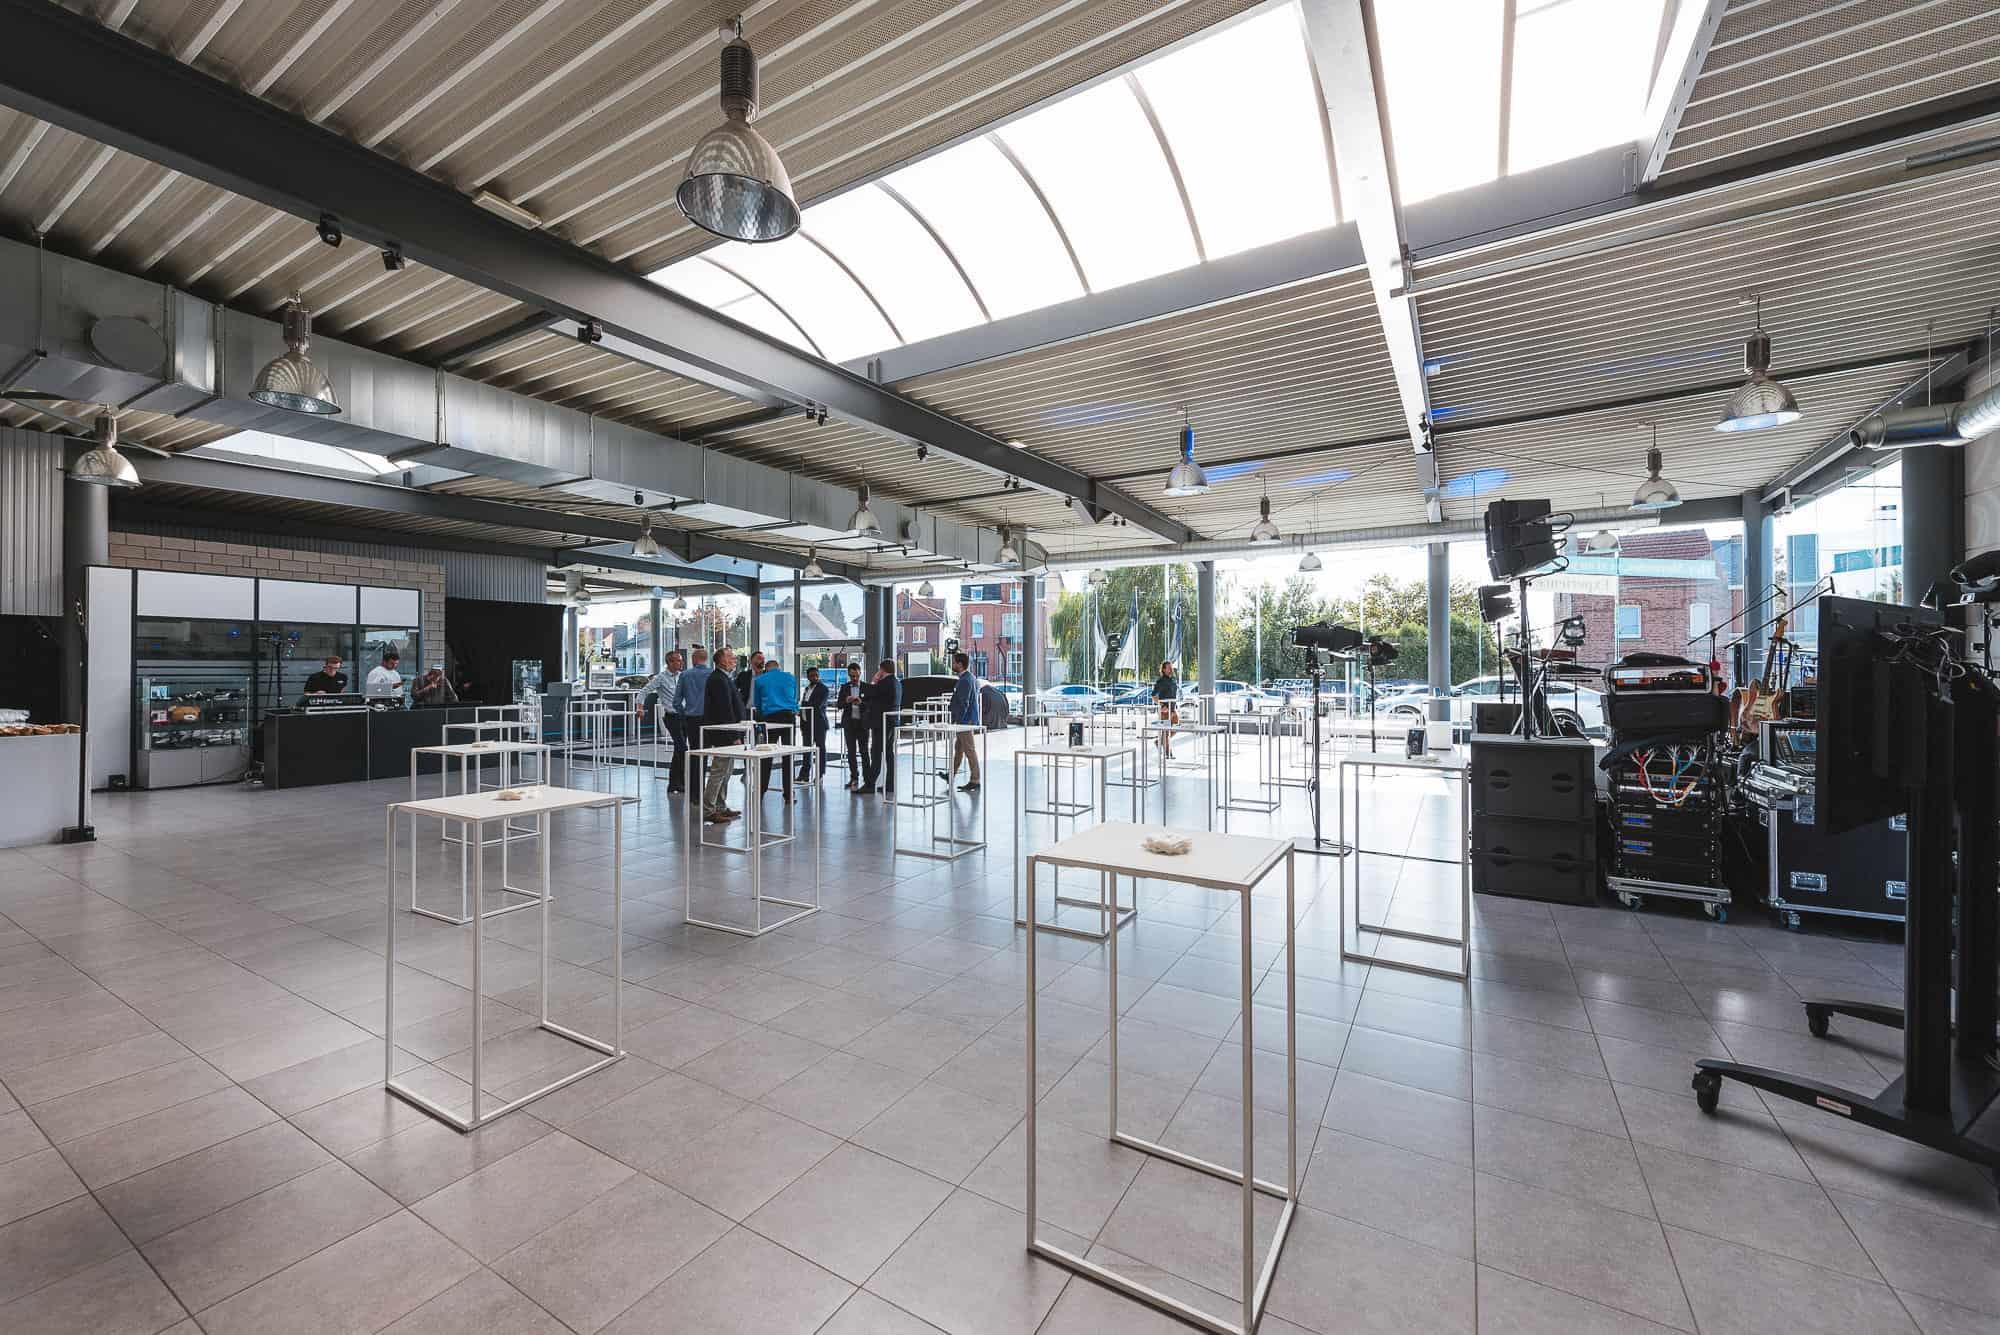 Inauguration du Garage Bernard à Hannut organisée par So Event